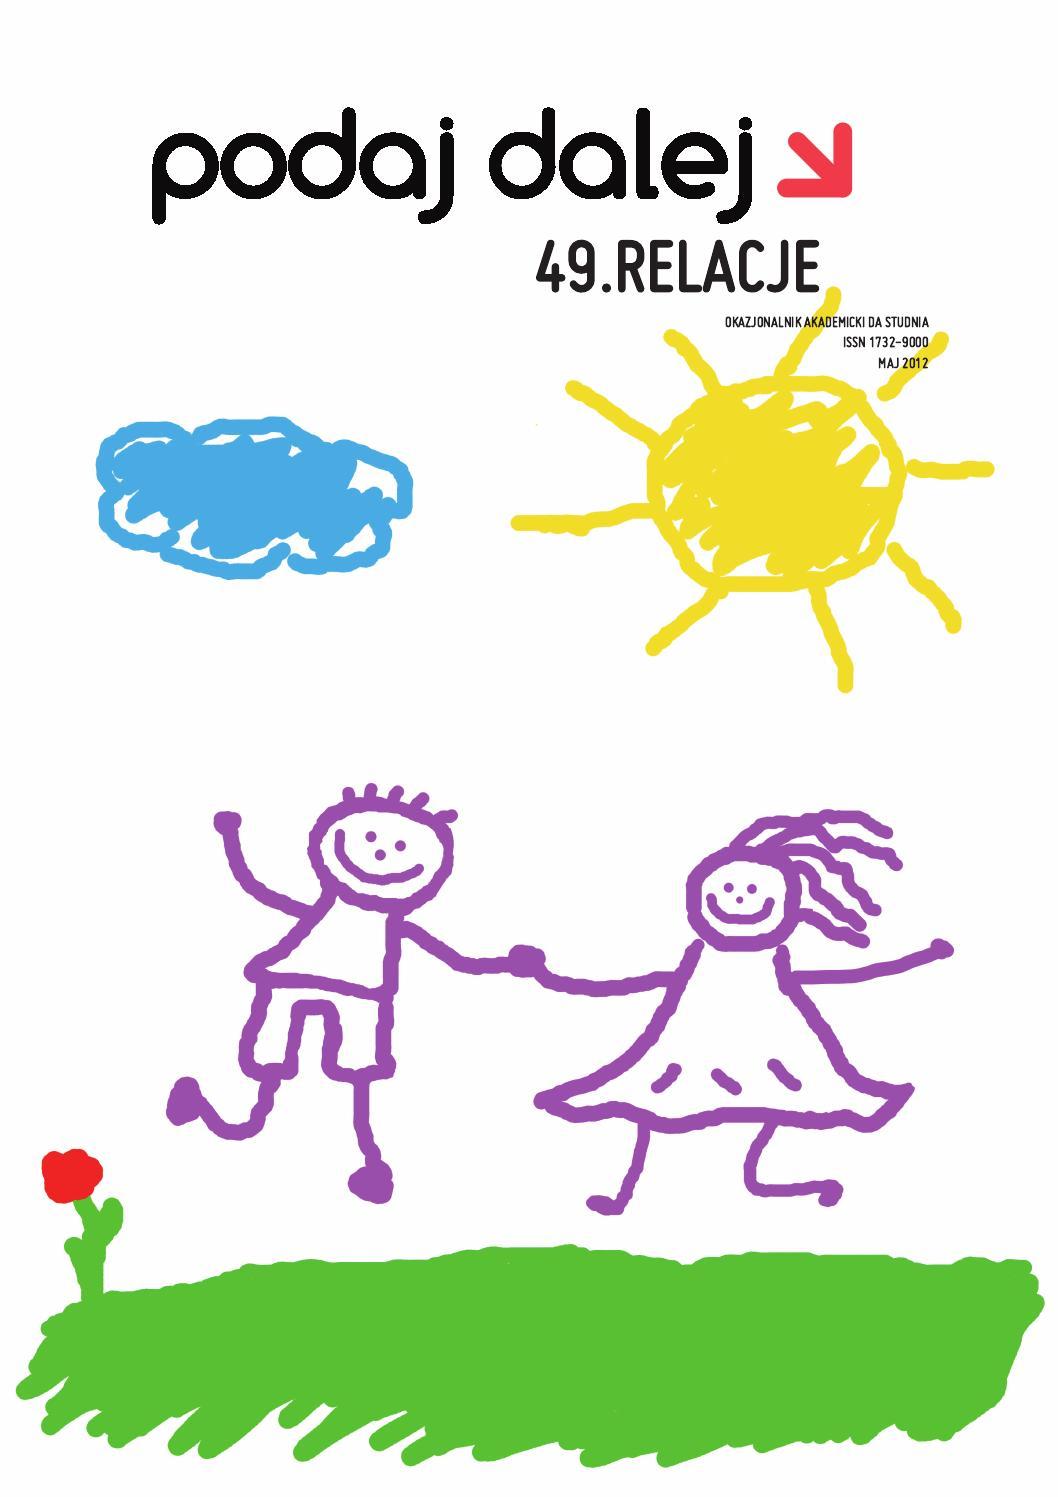 Relacje Podaj Dalej Nr 49 By Podaj Dalej Issuu